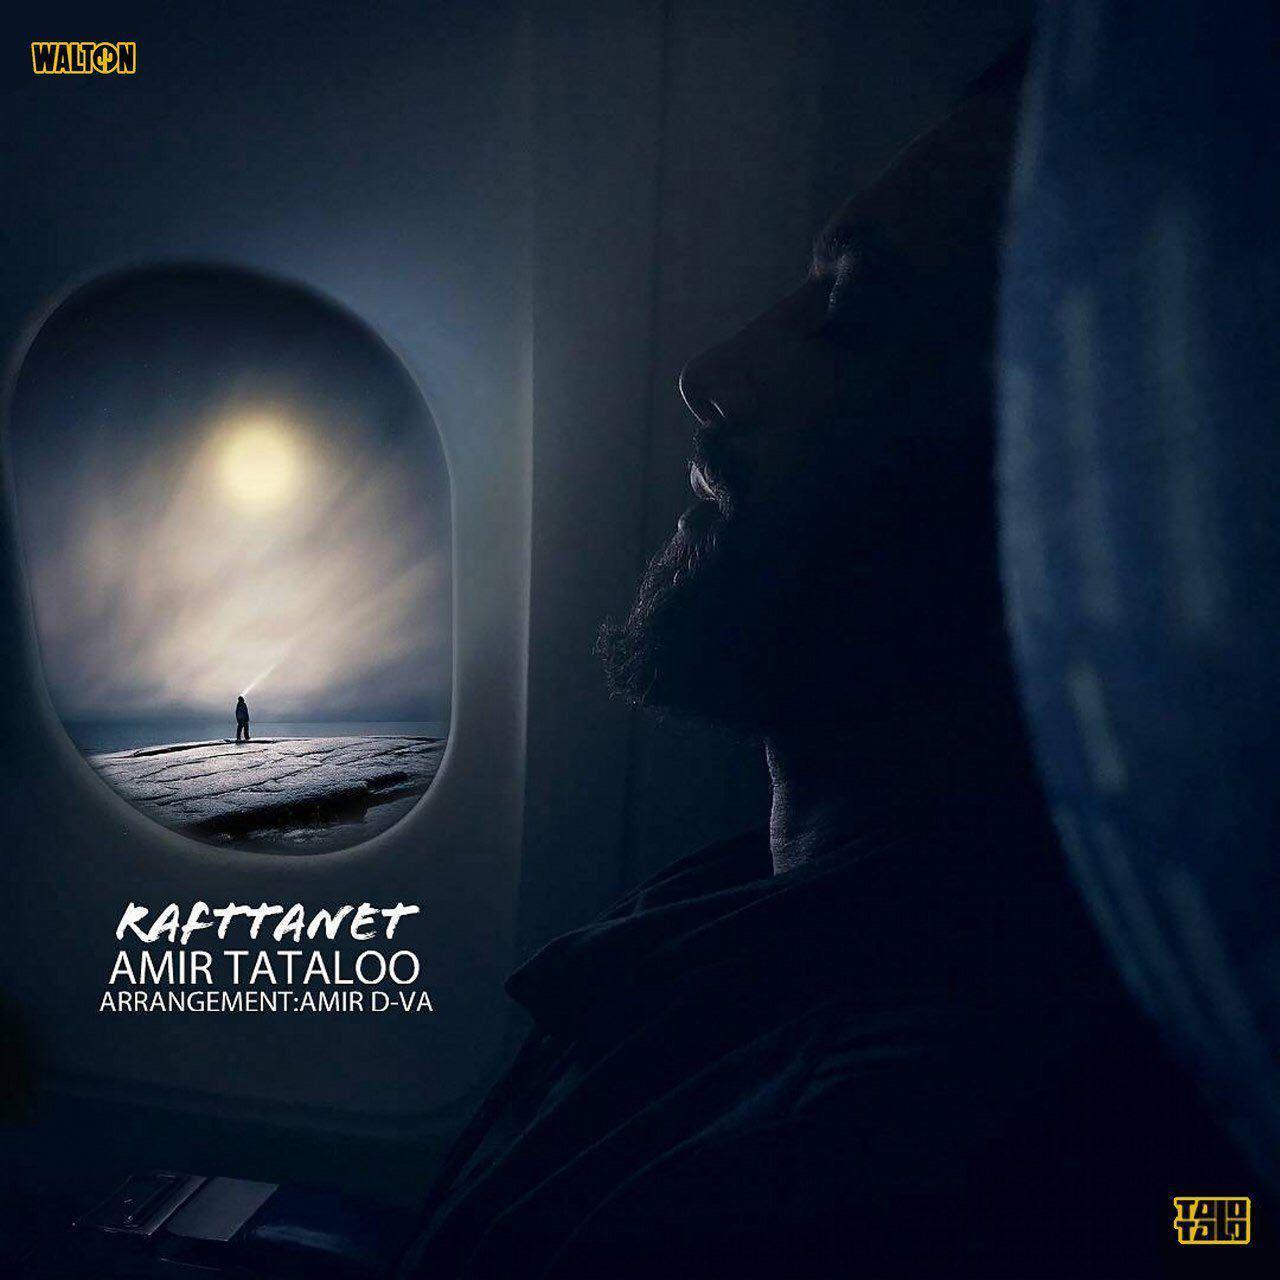 Amir Tataloo - Rafttanet